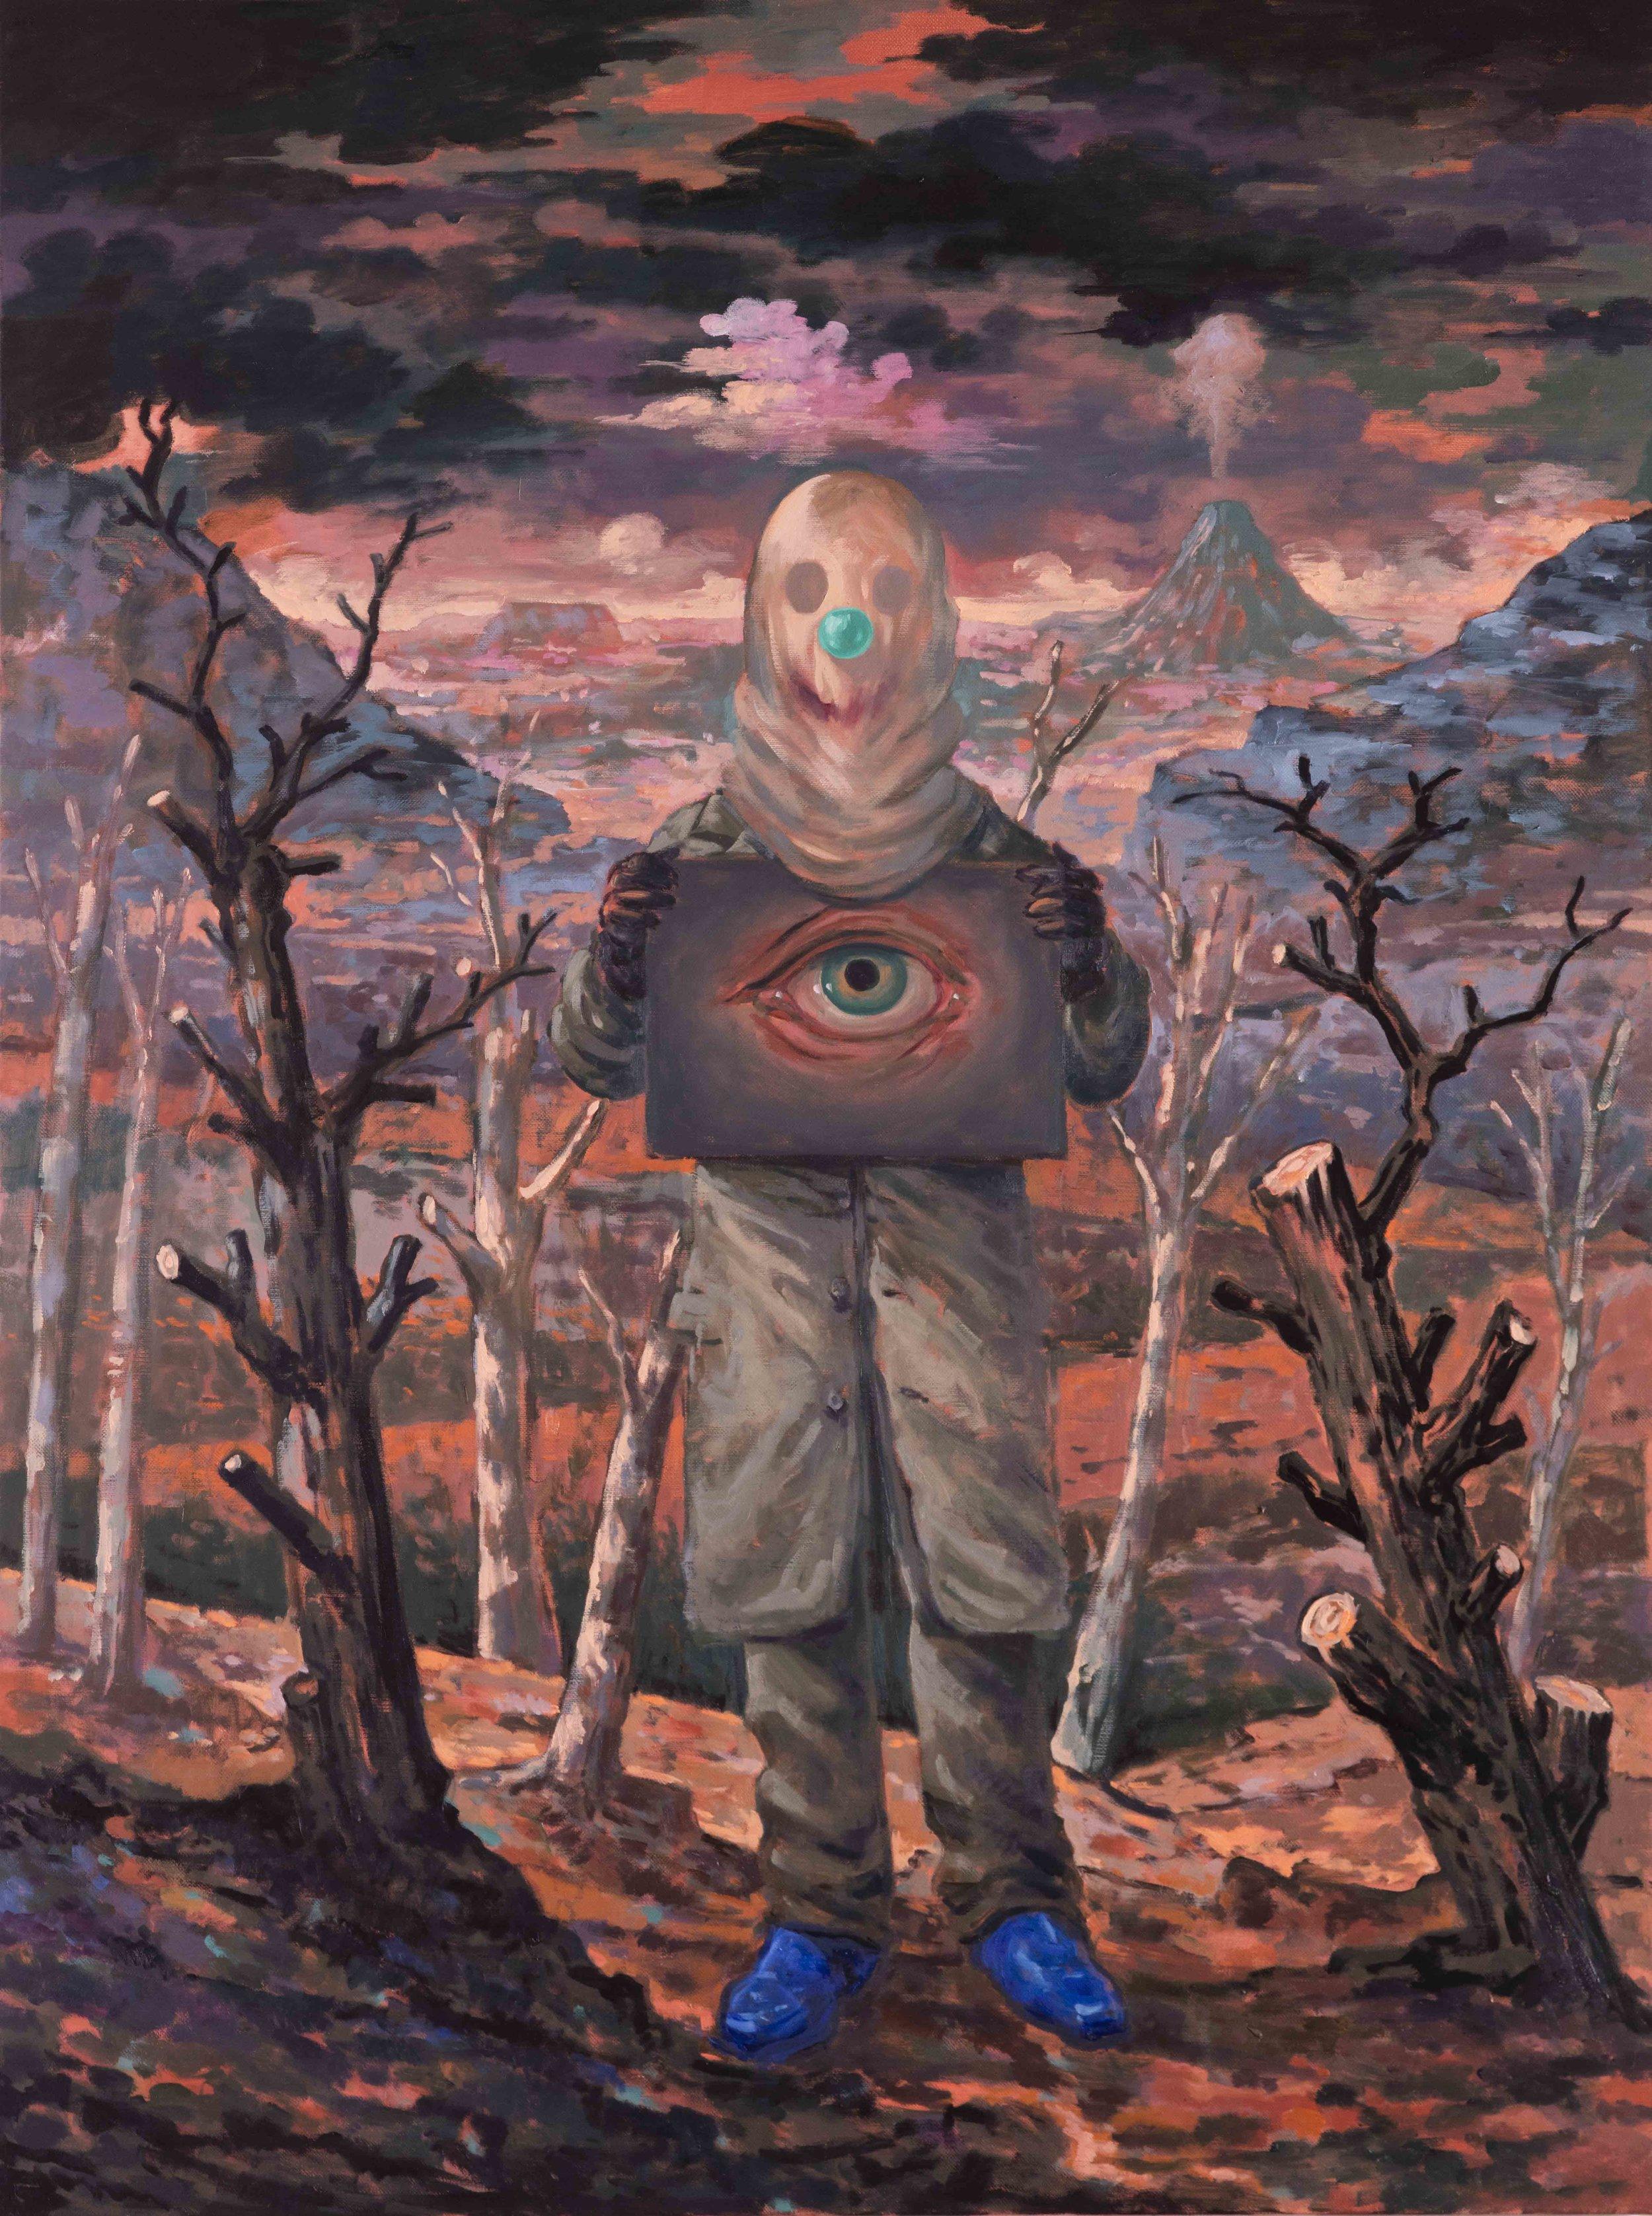 Michael Vale,  The Phantom Engineer II, 2016, Oil on linen, 122 x 92 cm